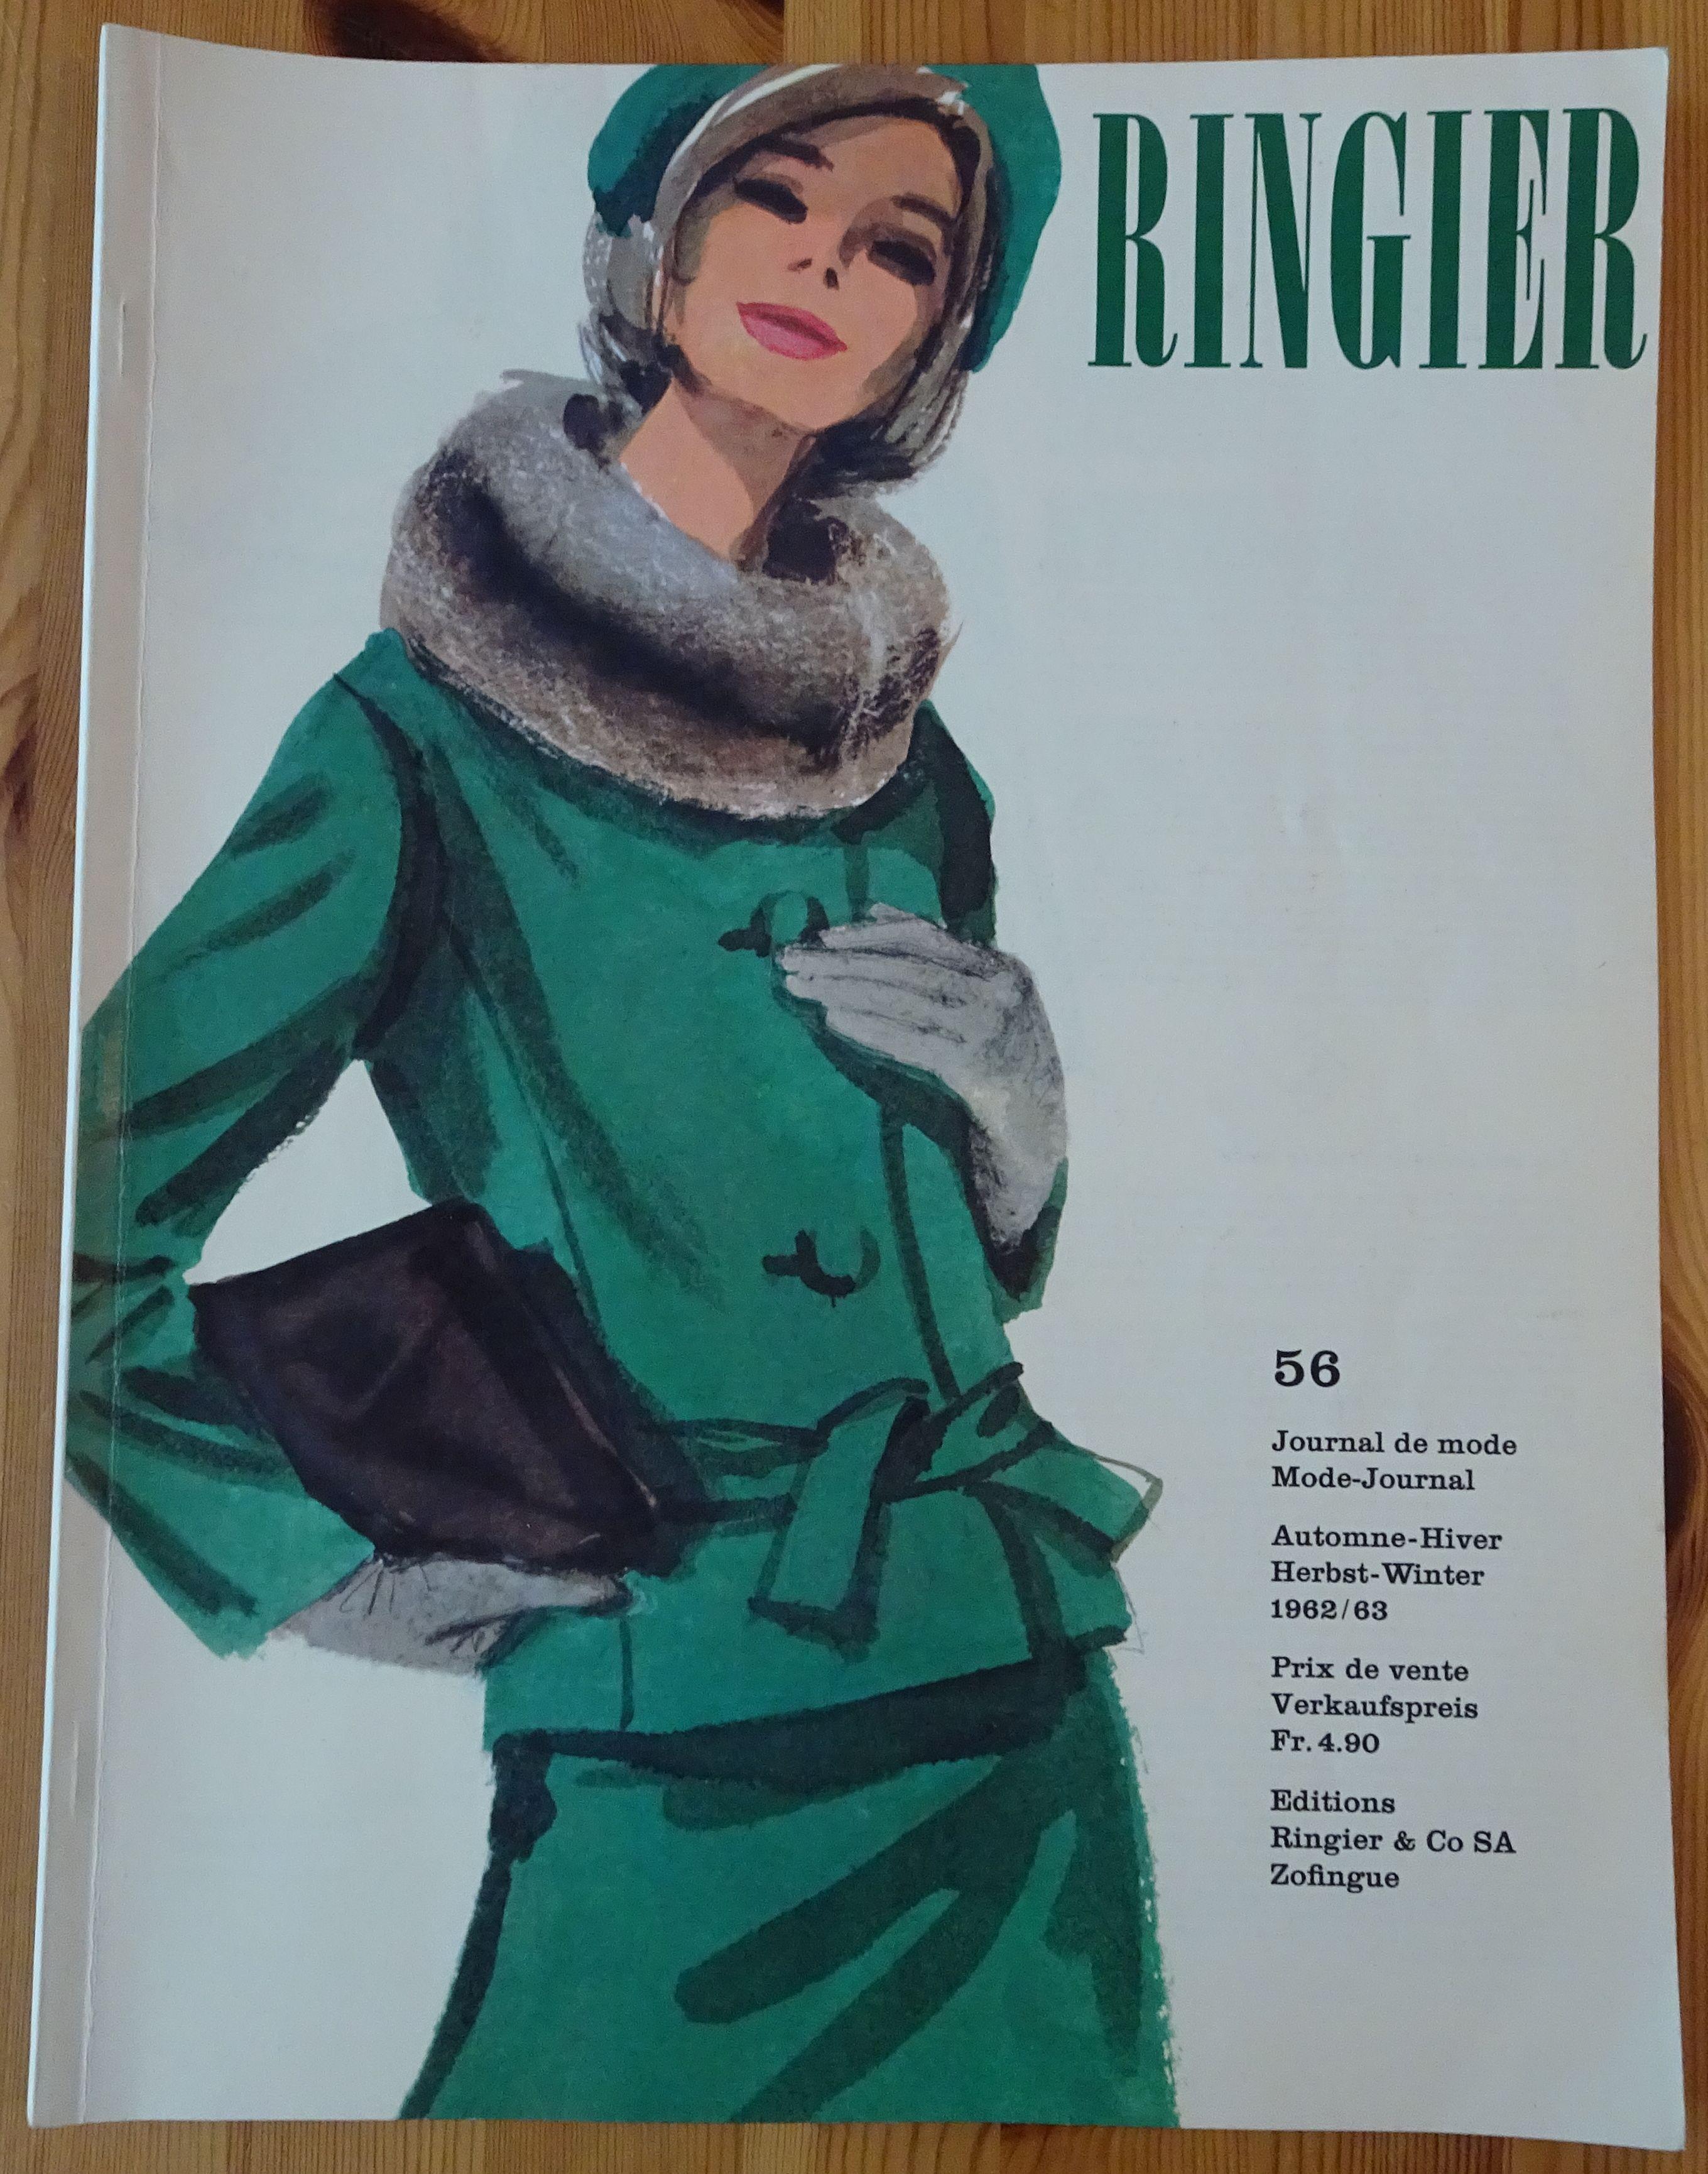 Ringier Journal de Mode Autumn/Winter 1962/63